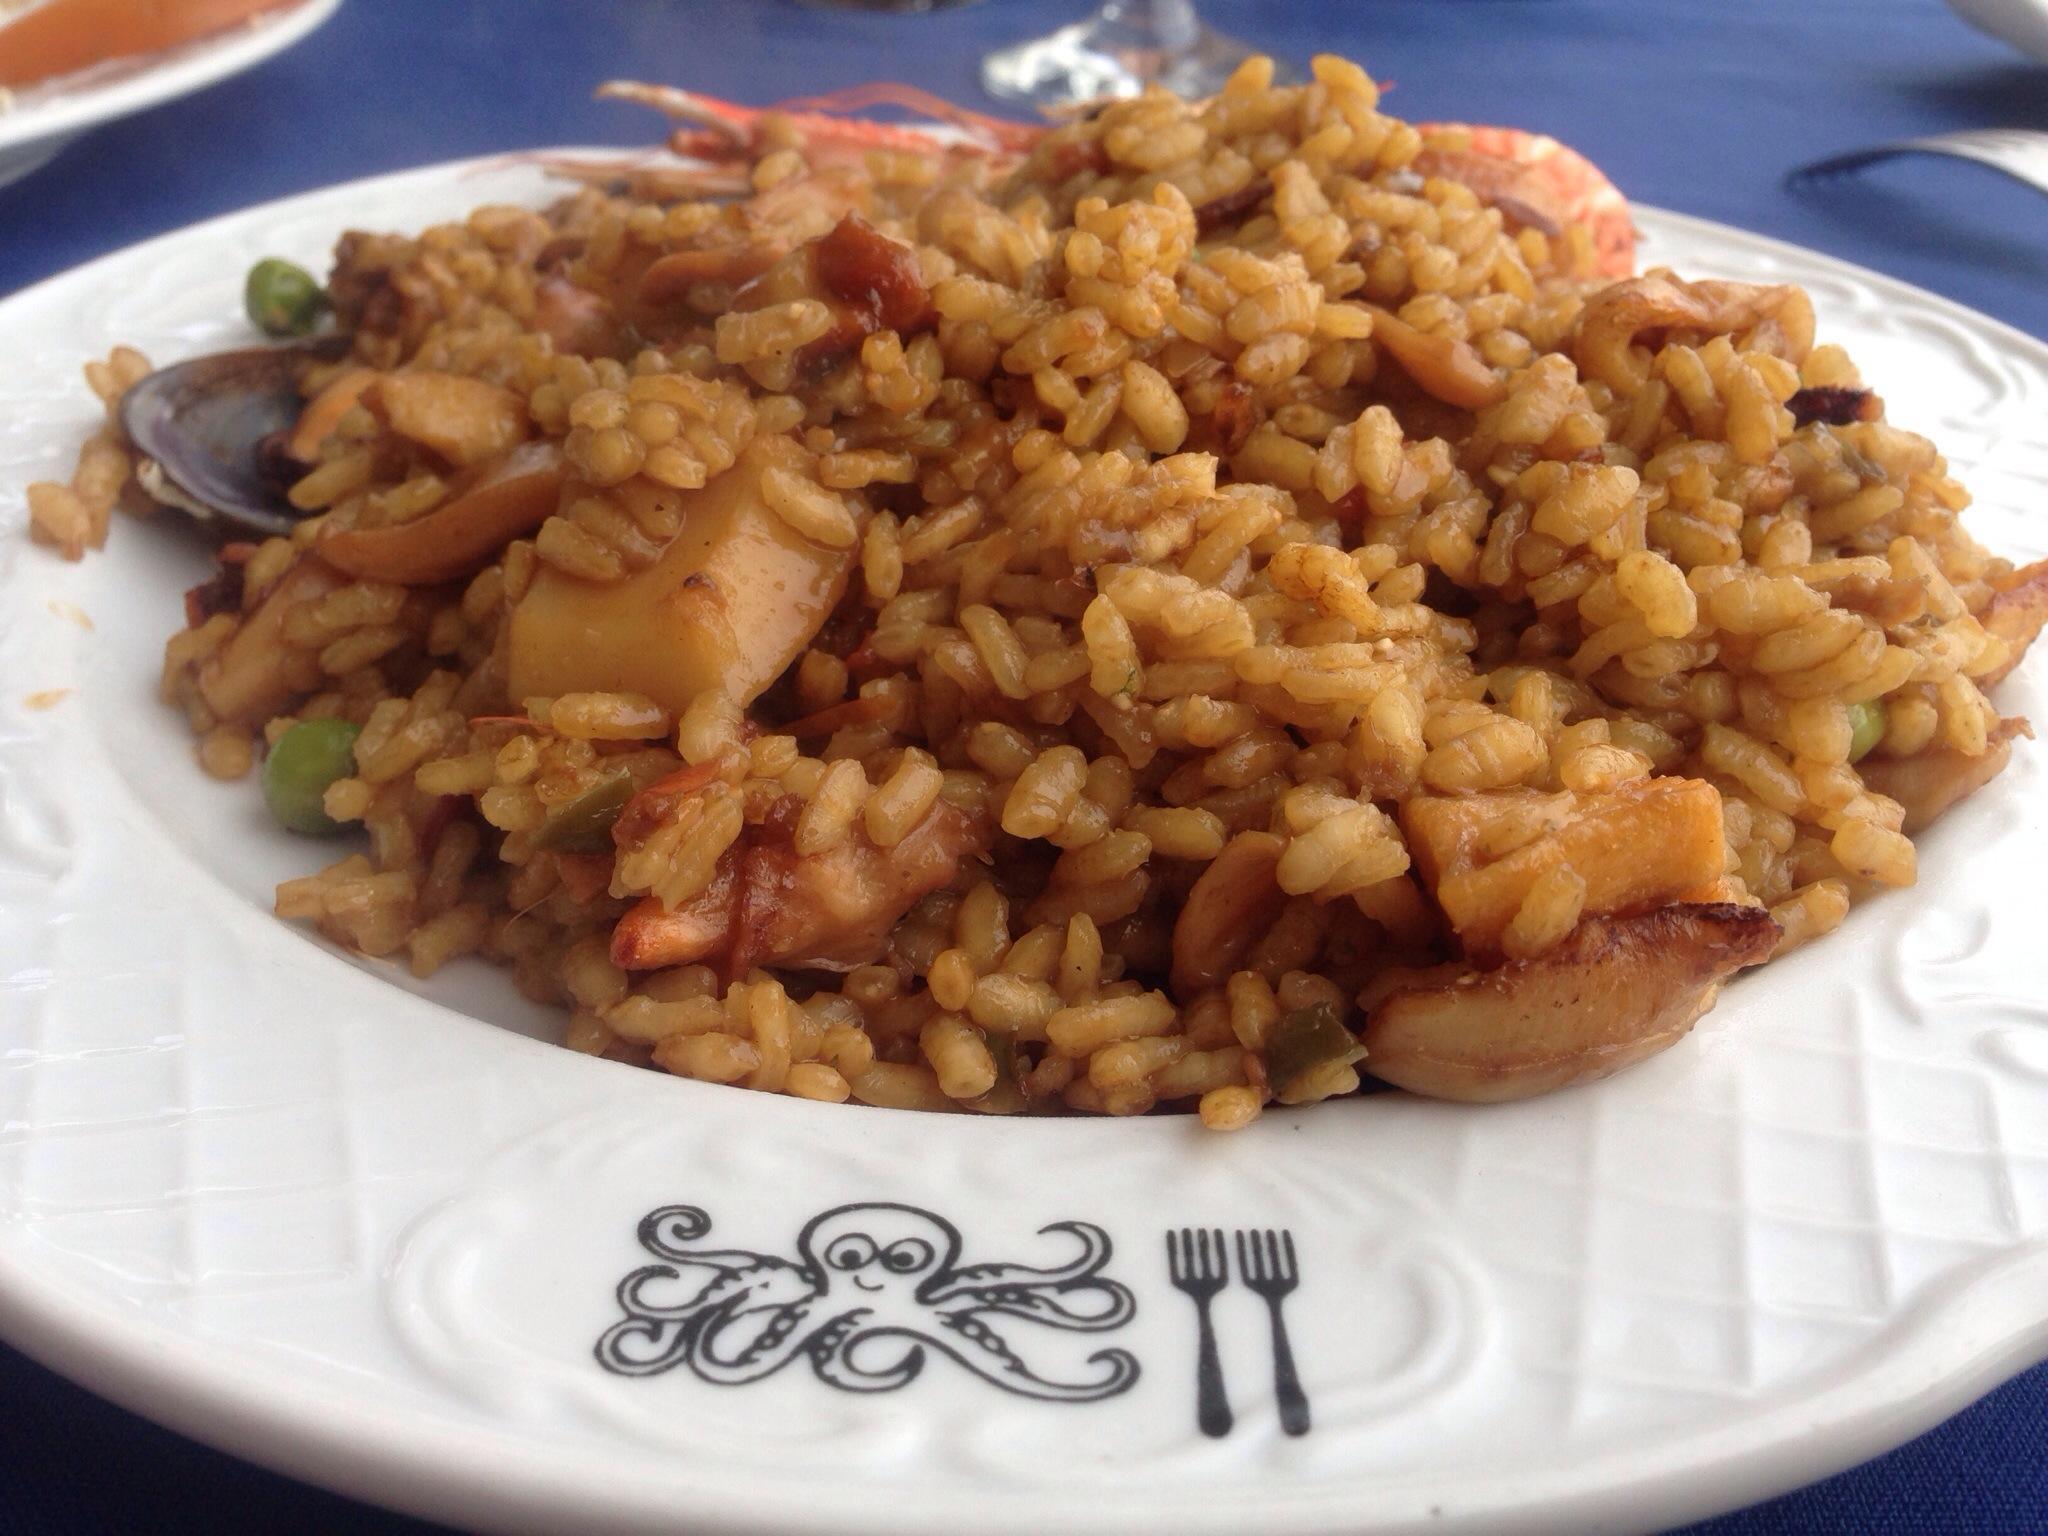 Things To Do in Spanish, Restaurants in Spanish